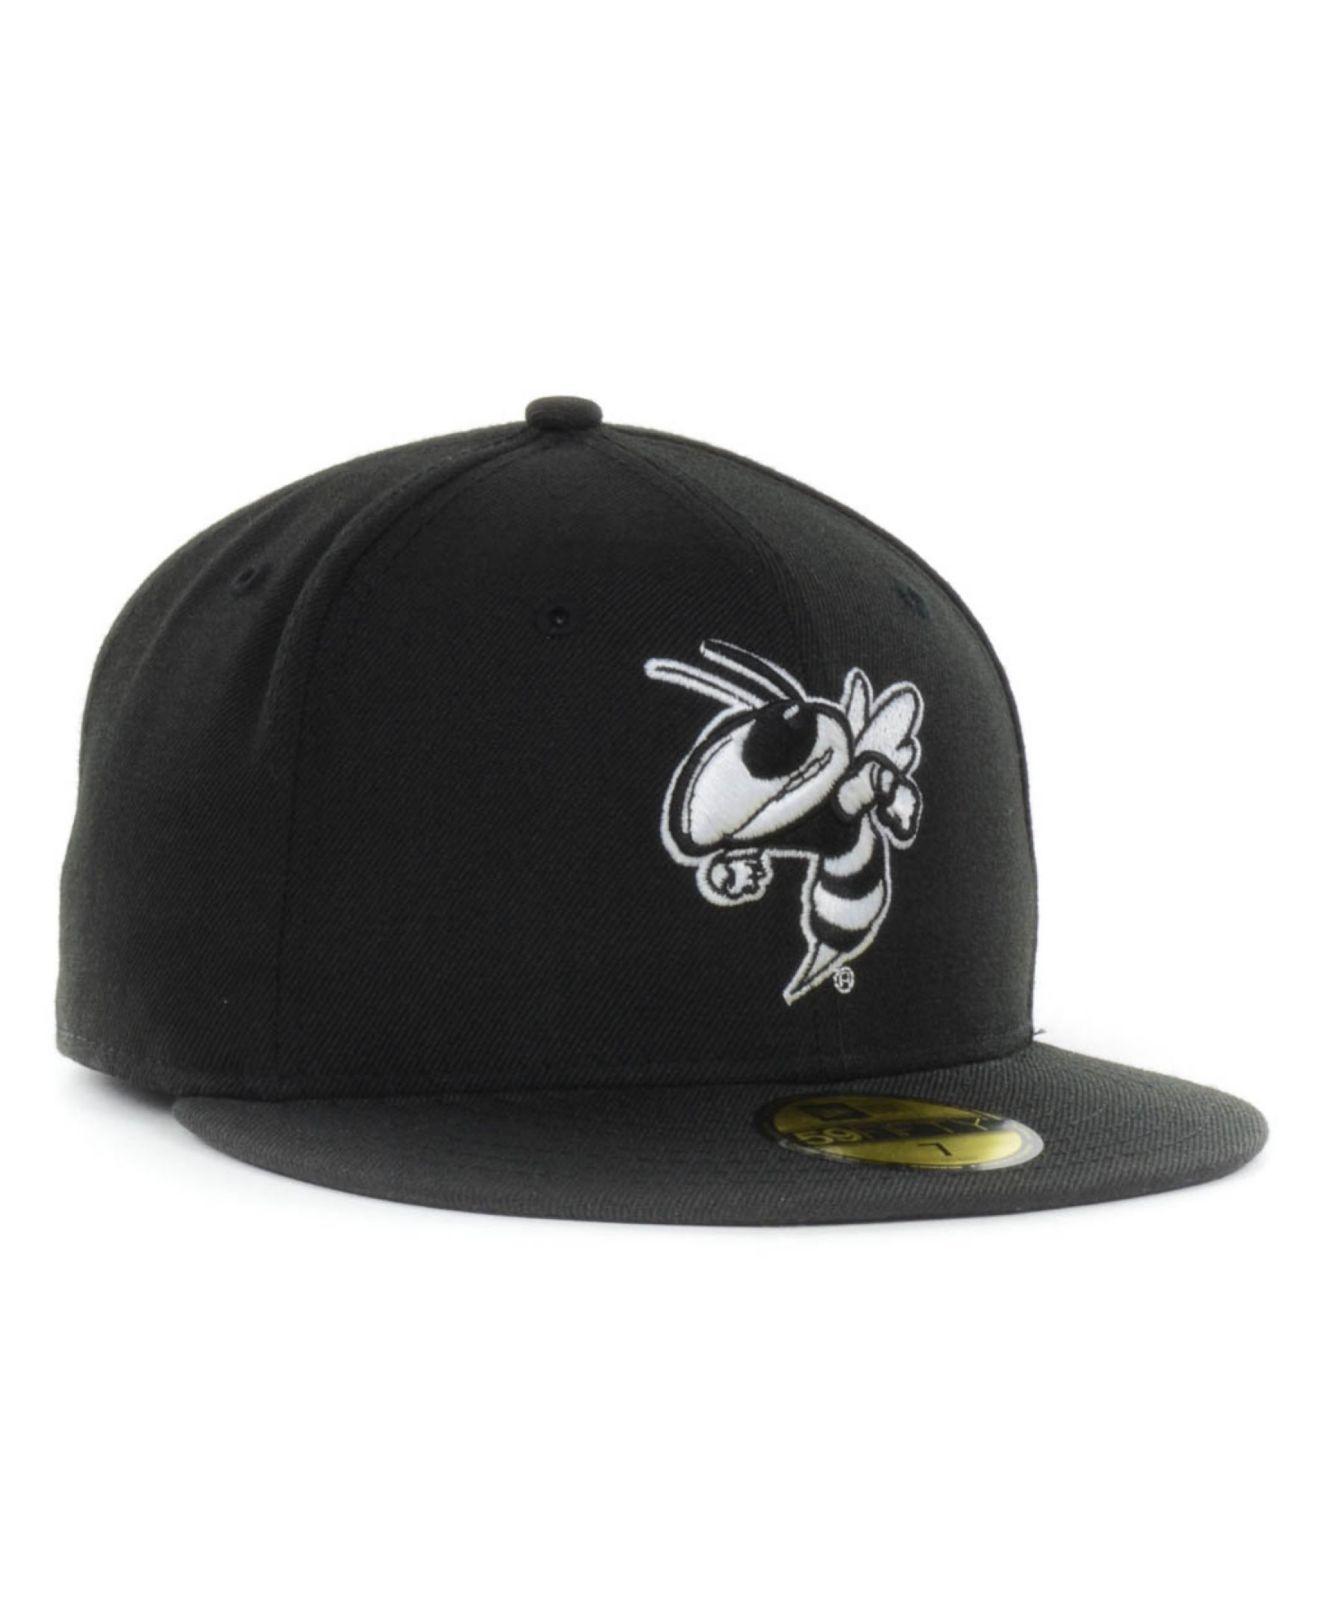 the best attitude ce972 65d6a KTZ Georgia Tech Yellow Jackets Ncaa Black On Black With White ...